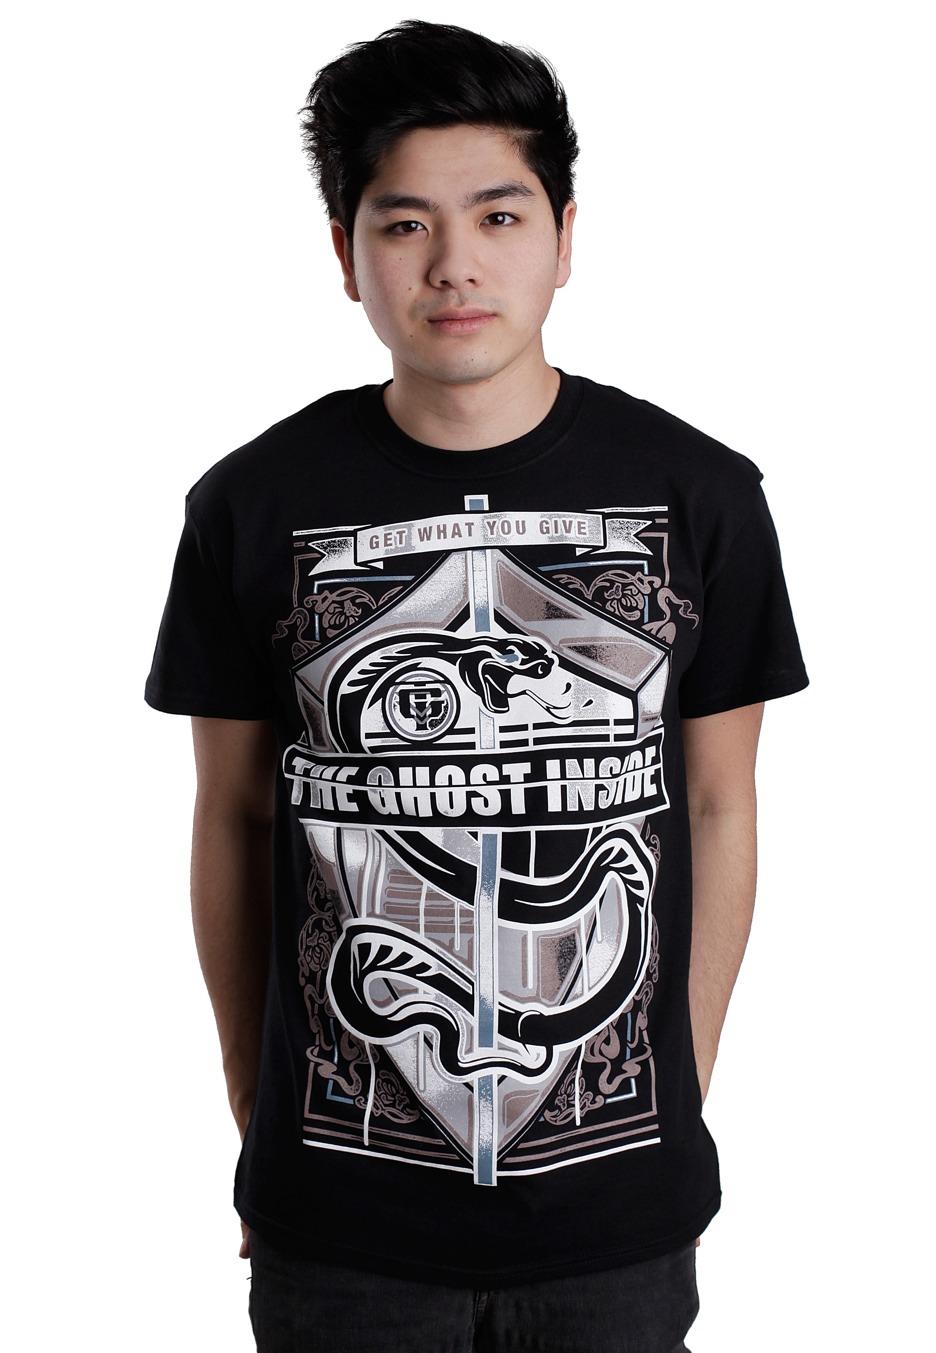 The Ghost Inside Snake Crest T-Shirt